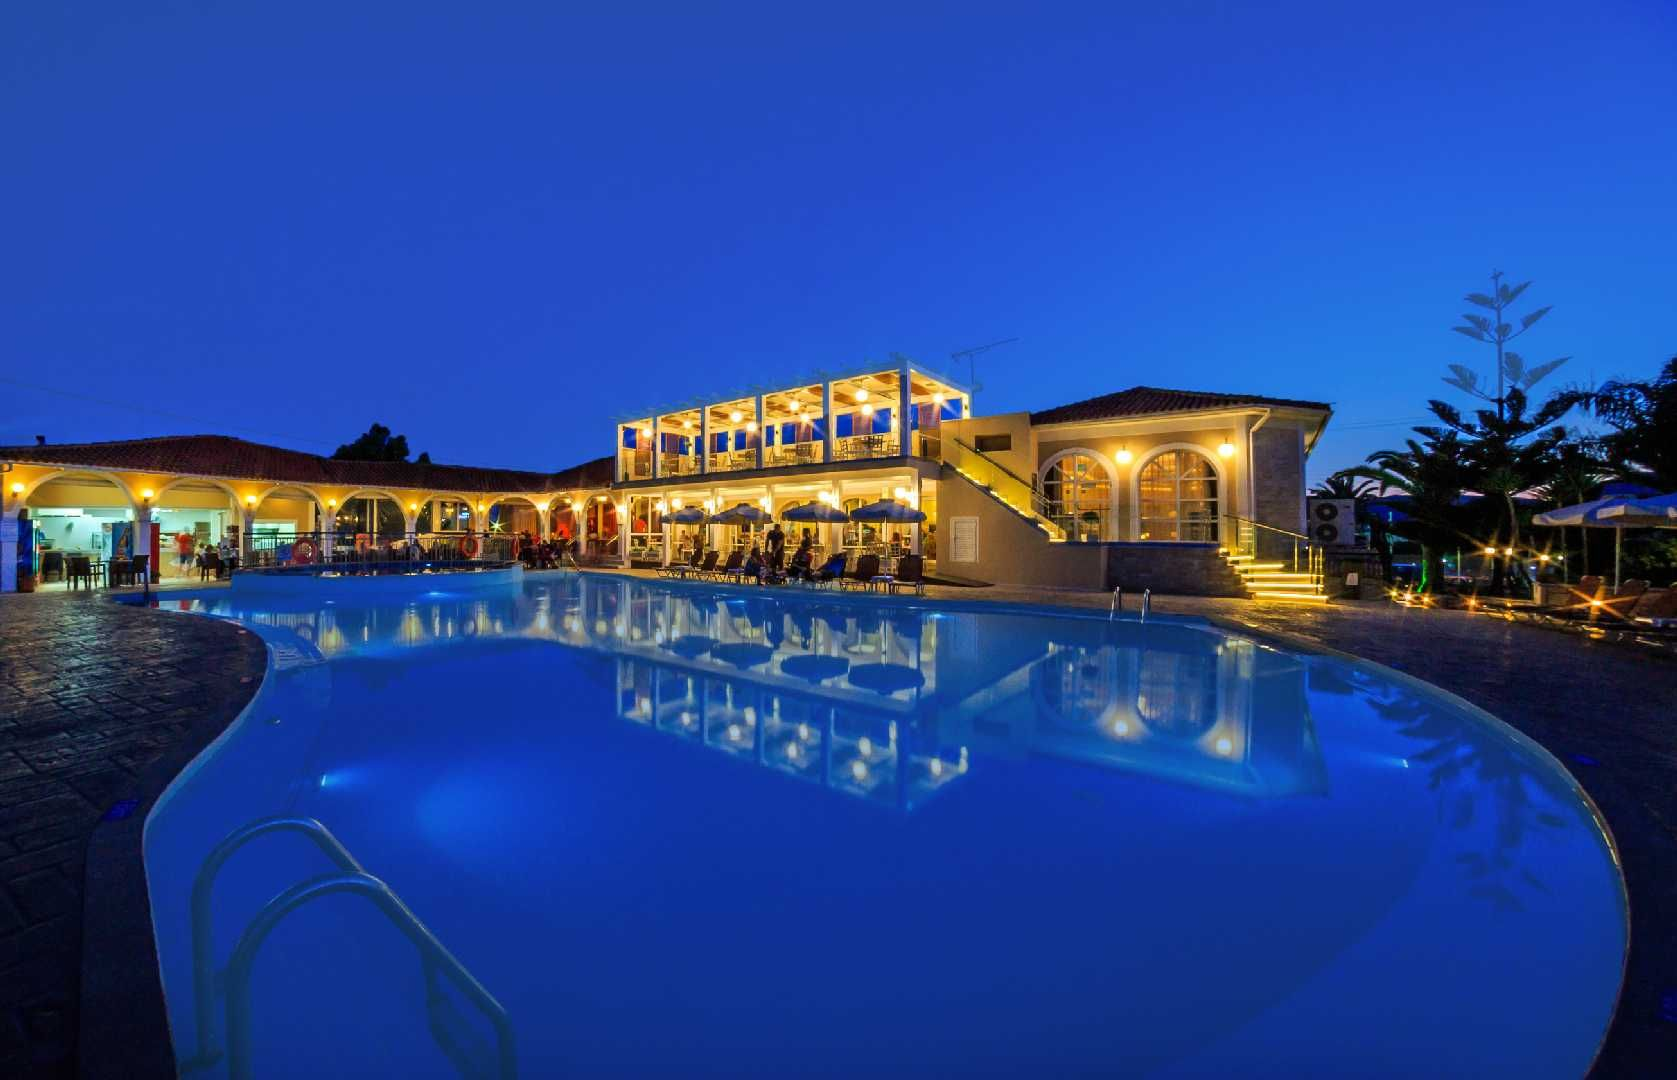 4* Marelen Hotel - Ζάκυνθος ✦ 2 Ημέρες (1 Διανυκτέρευση) ✦ 2 άτομα ✦ Πρωινό ✦ 01/05/2021 έως 31/05/2021 ✦ Κοντά στην παραλία!